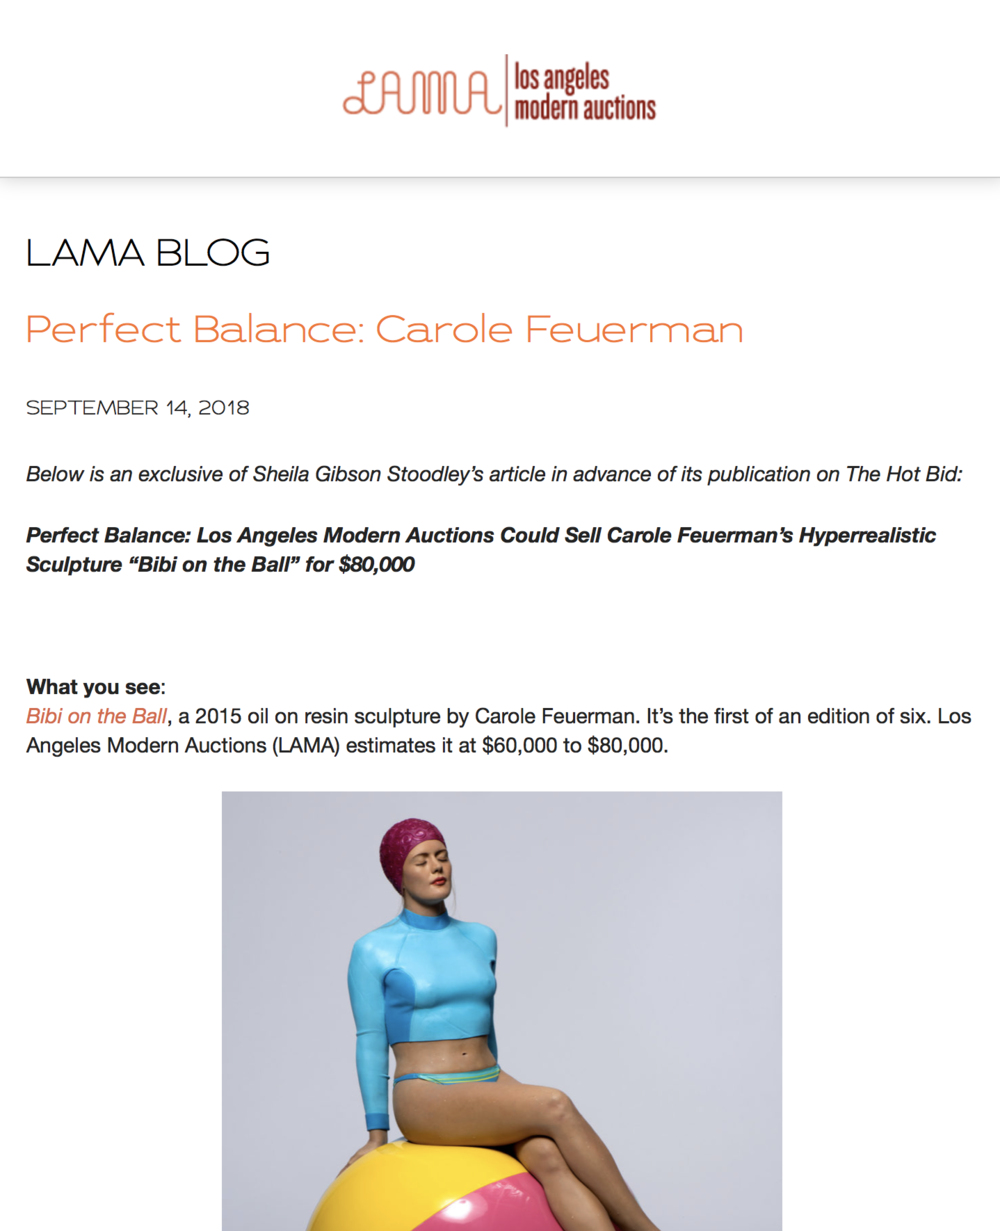 Perfect Balance: Carole Feuerman